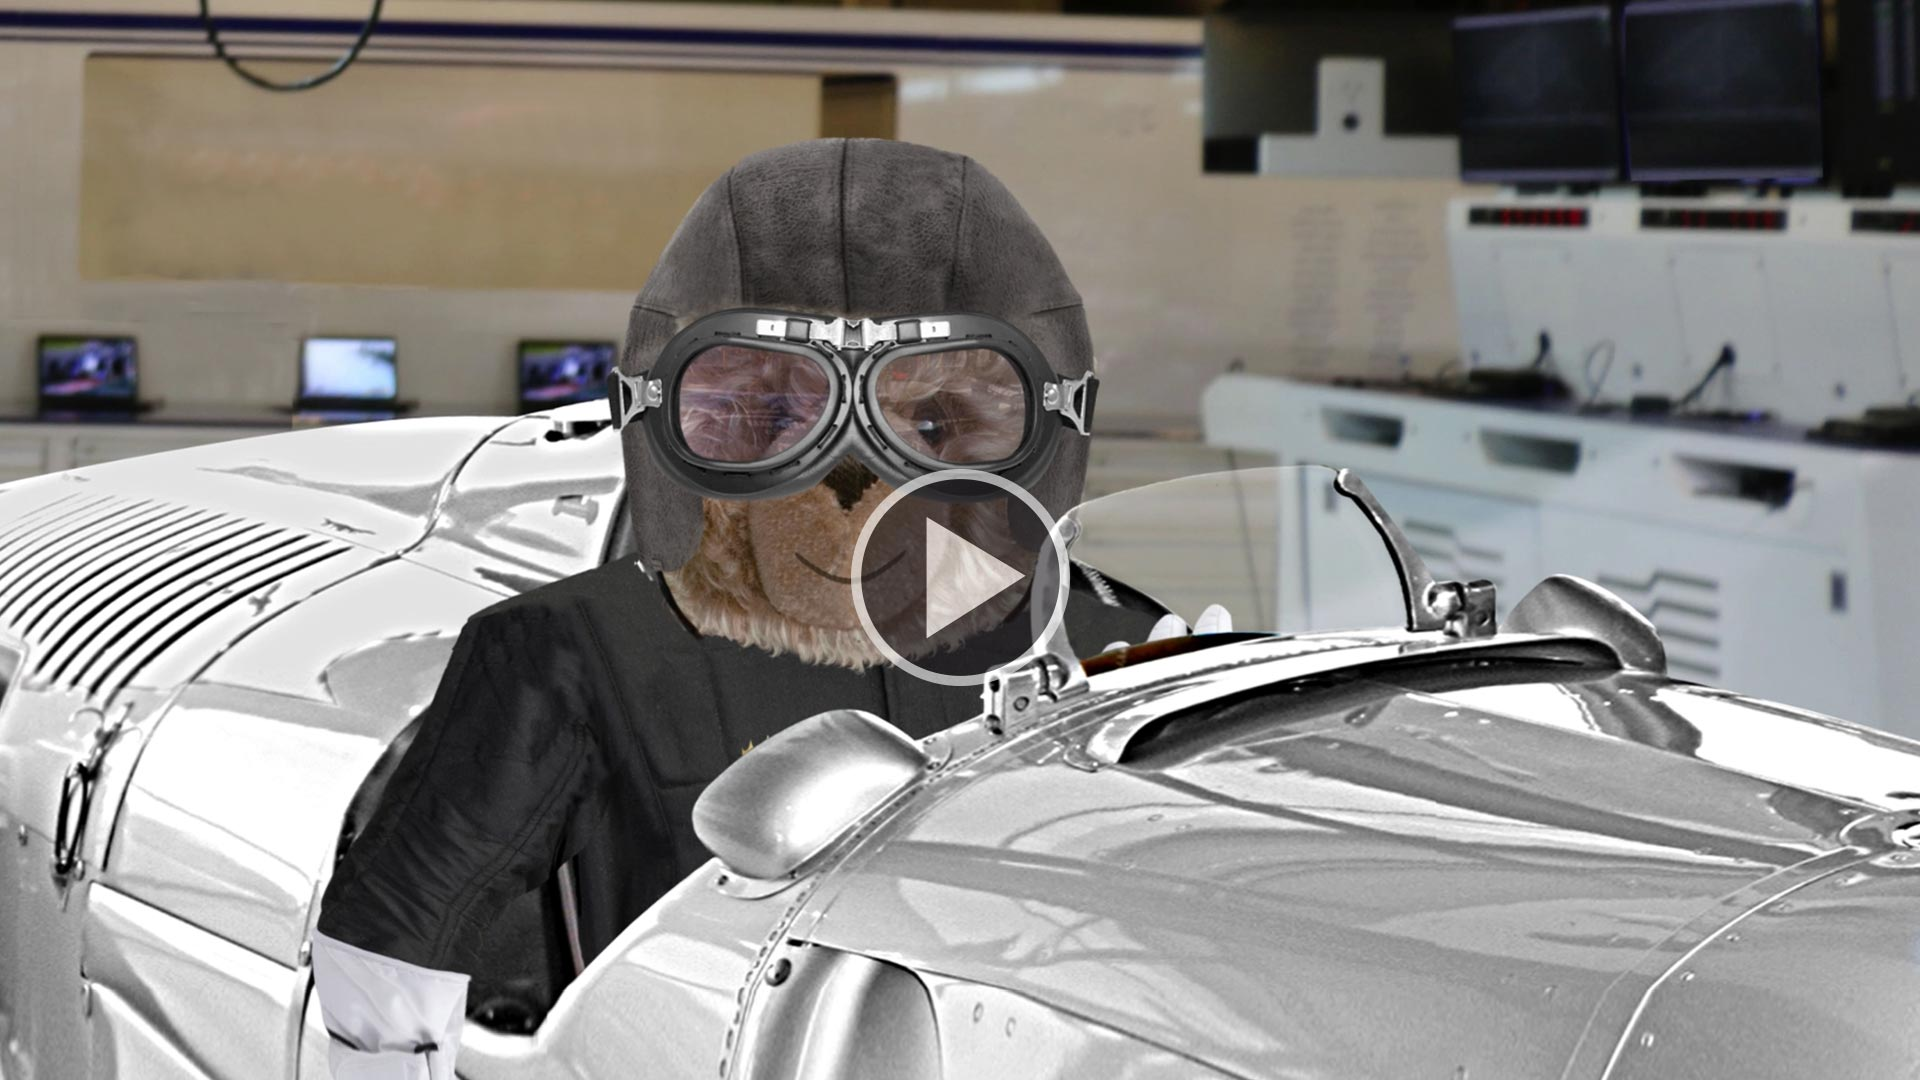 Teddybär-König Opa bei der Formel 1